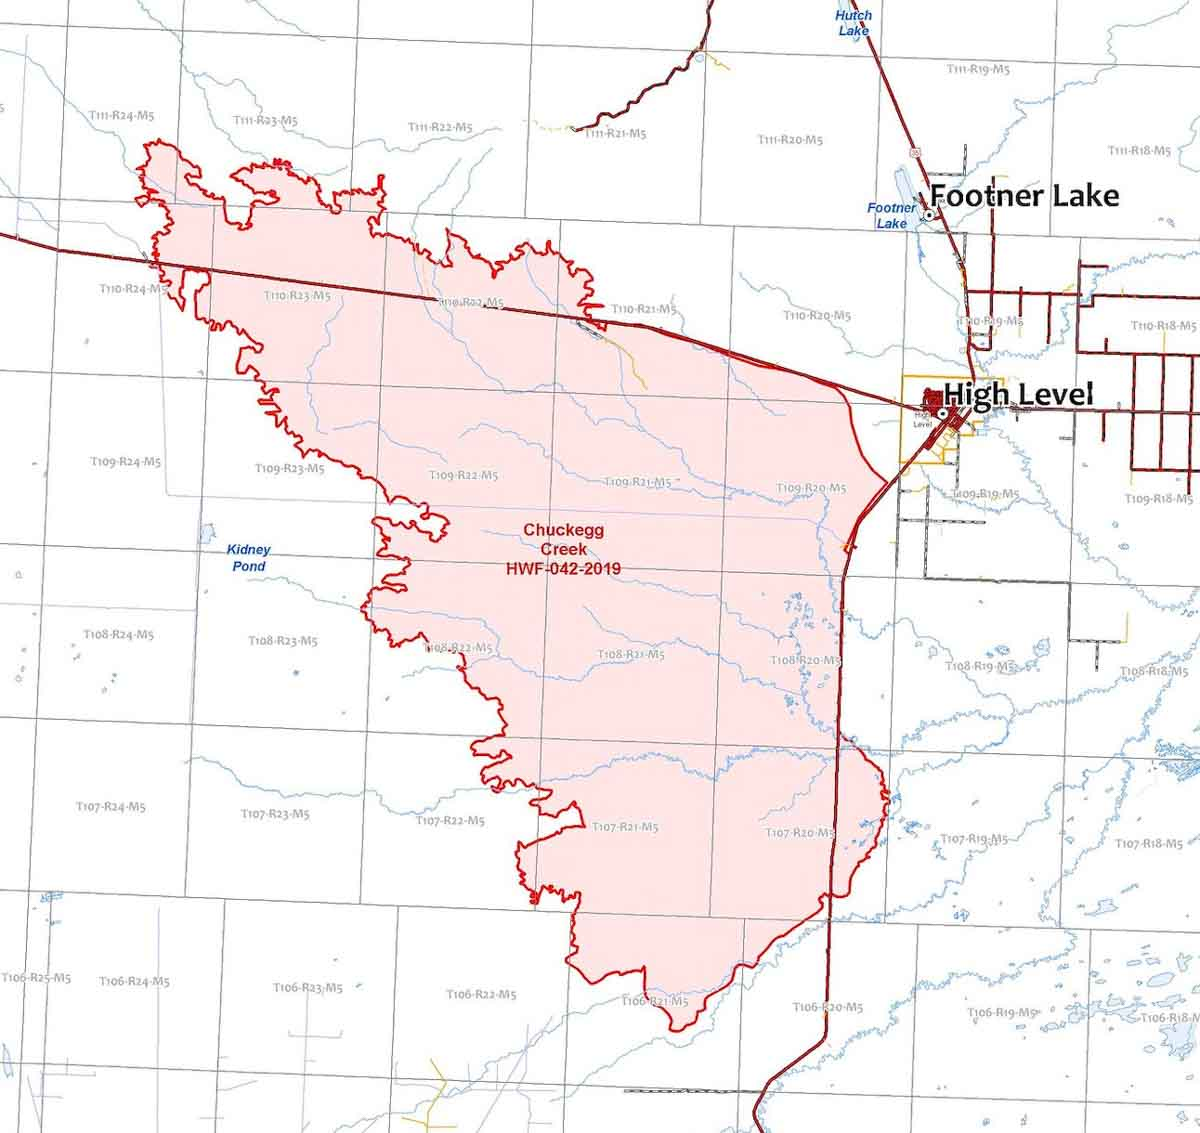 map Chuckegg Creek Fire High Level Alberta